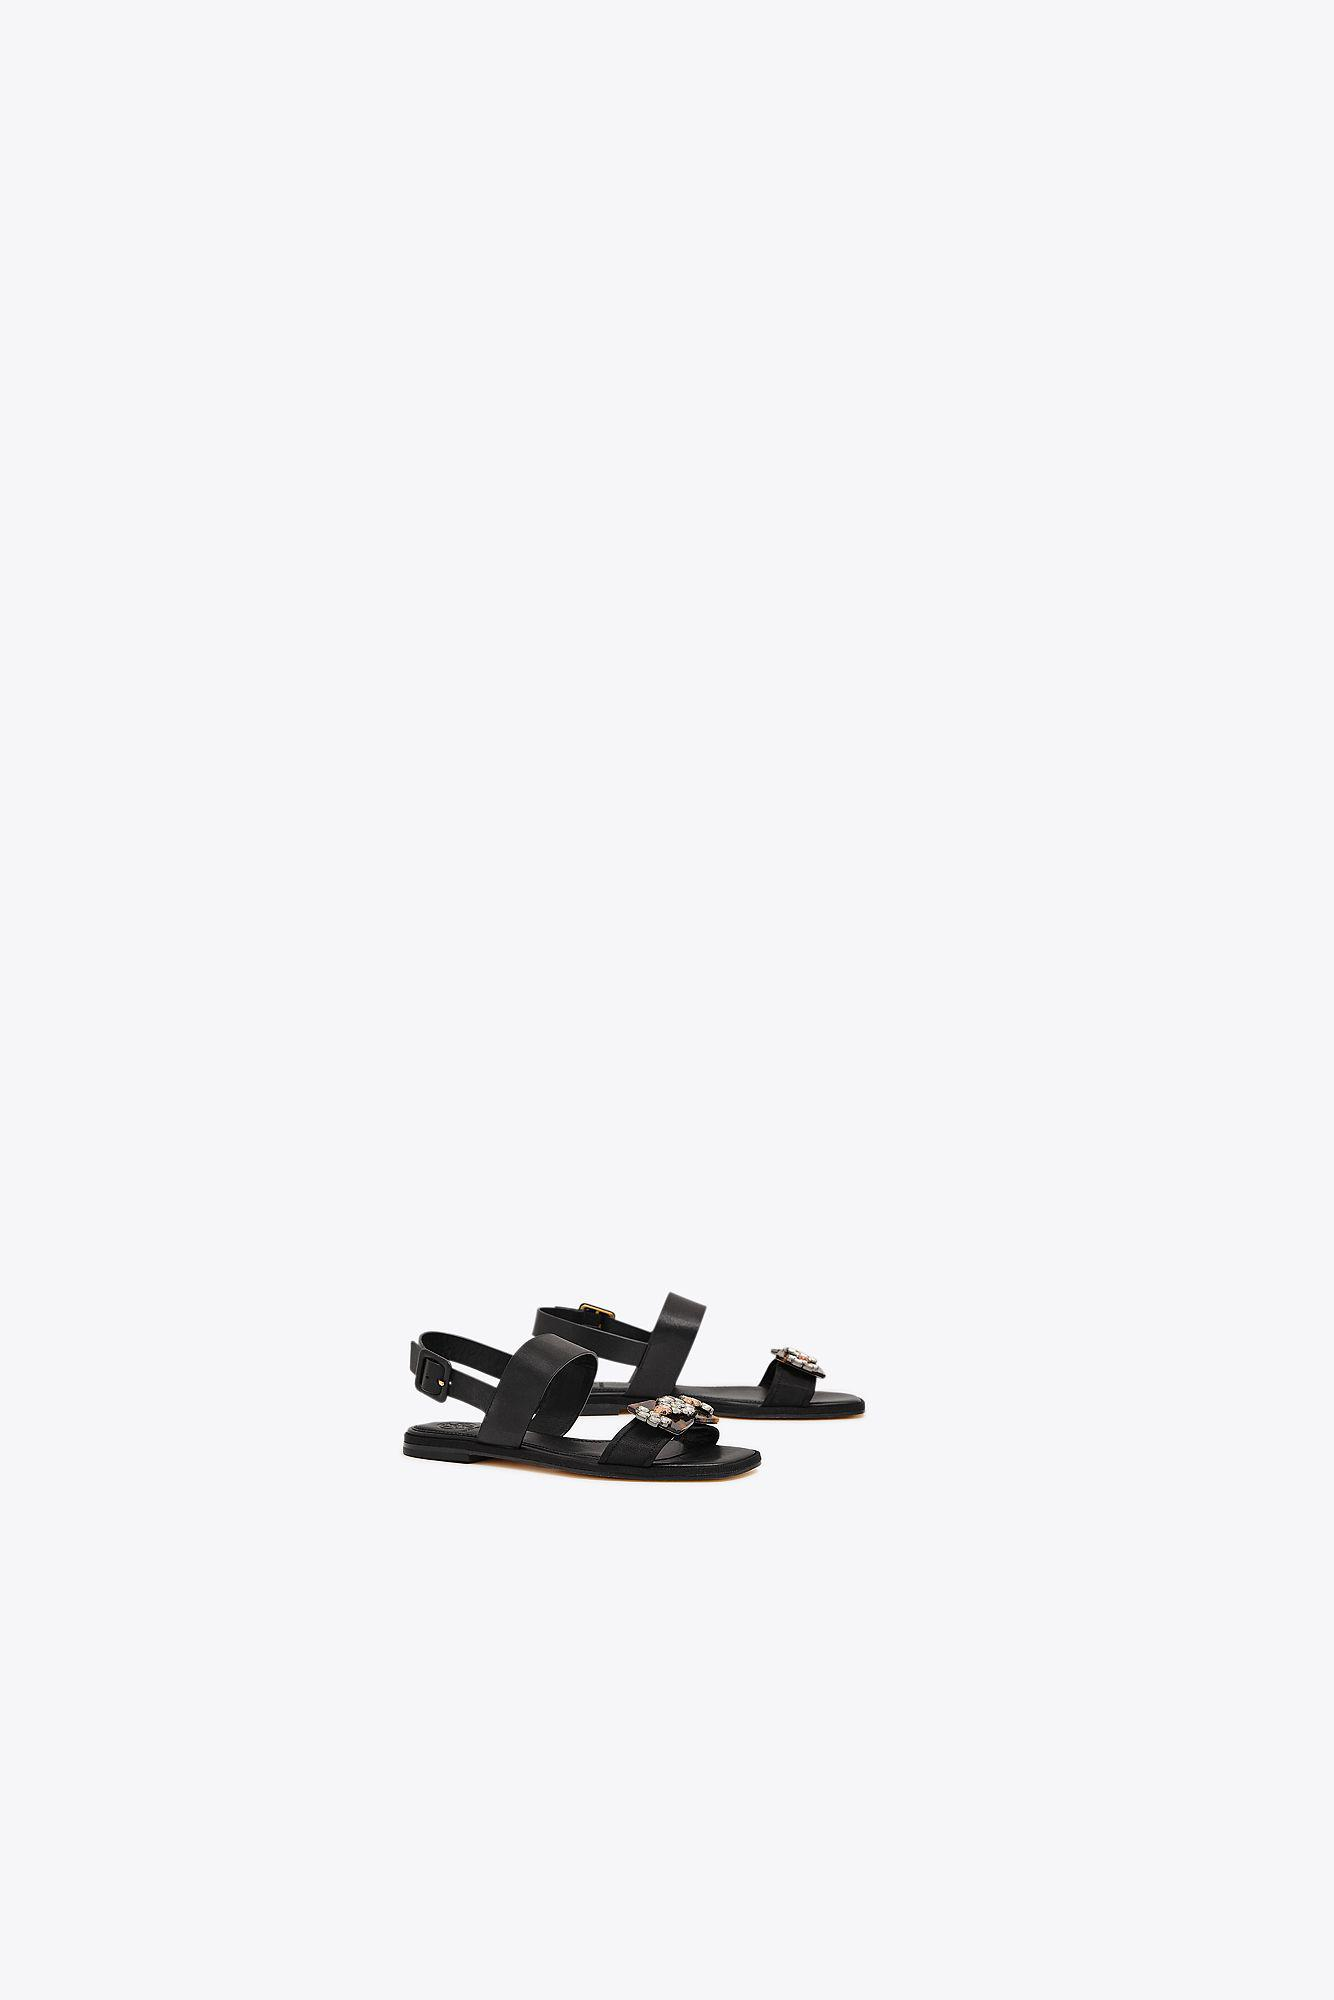 2758a61ad11 Tory Burch Delaney Embellished Flat Sandal in Black - Lyst